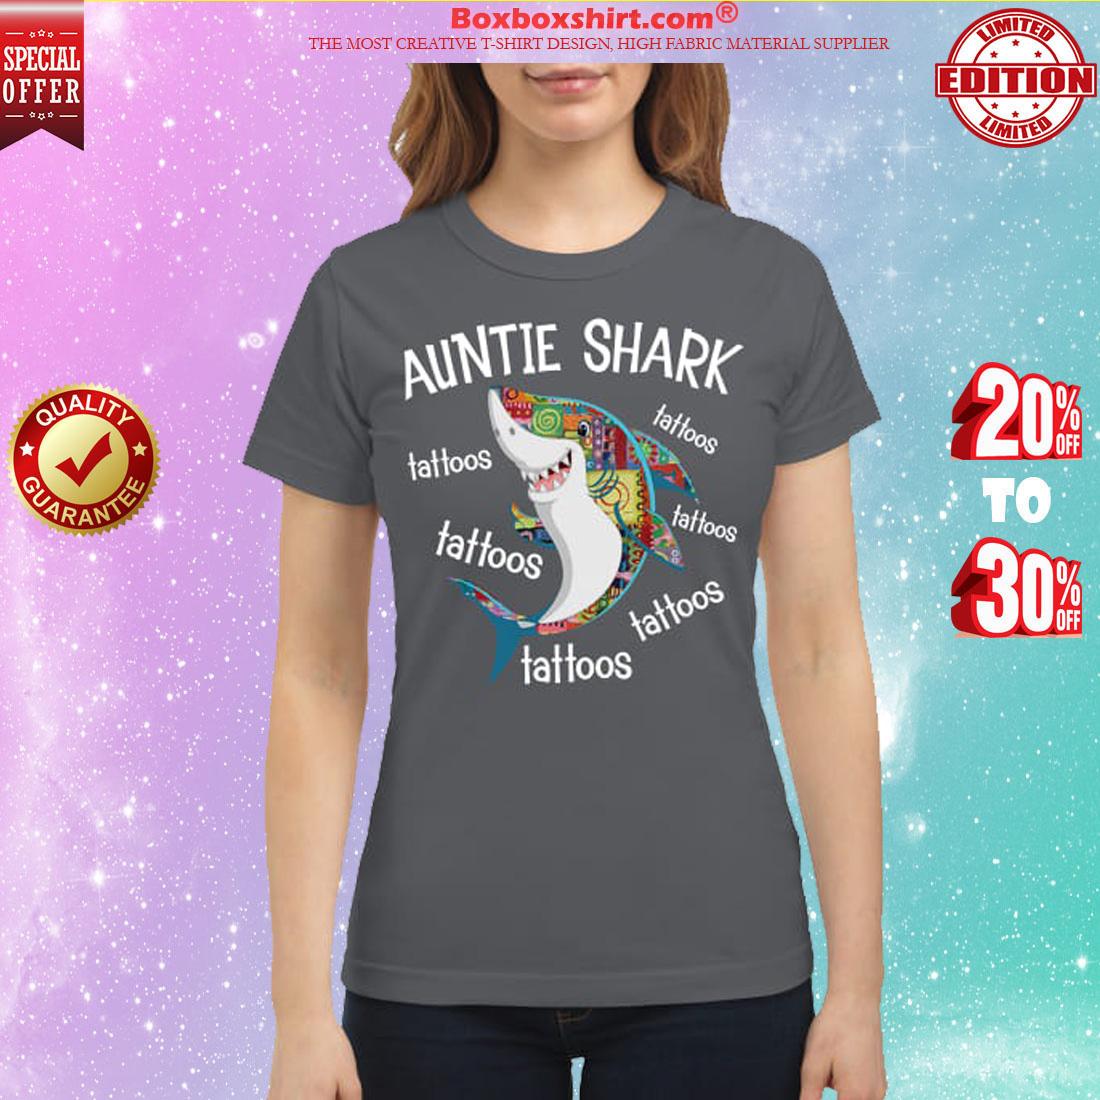 Auntie shark tattoos classic shirt